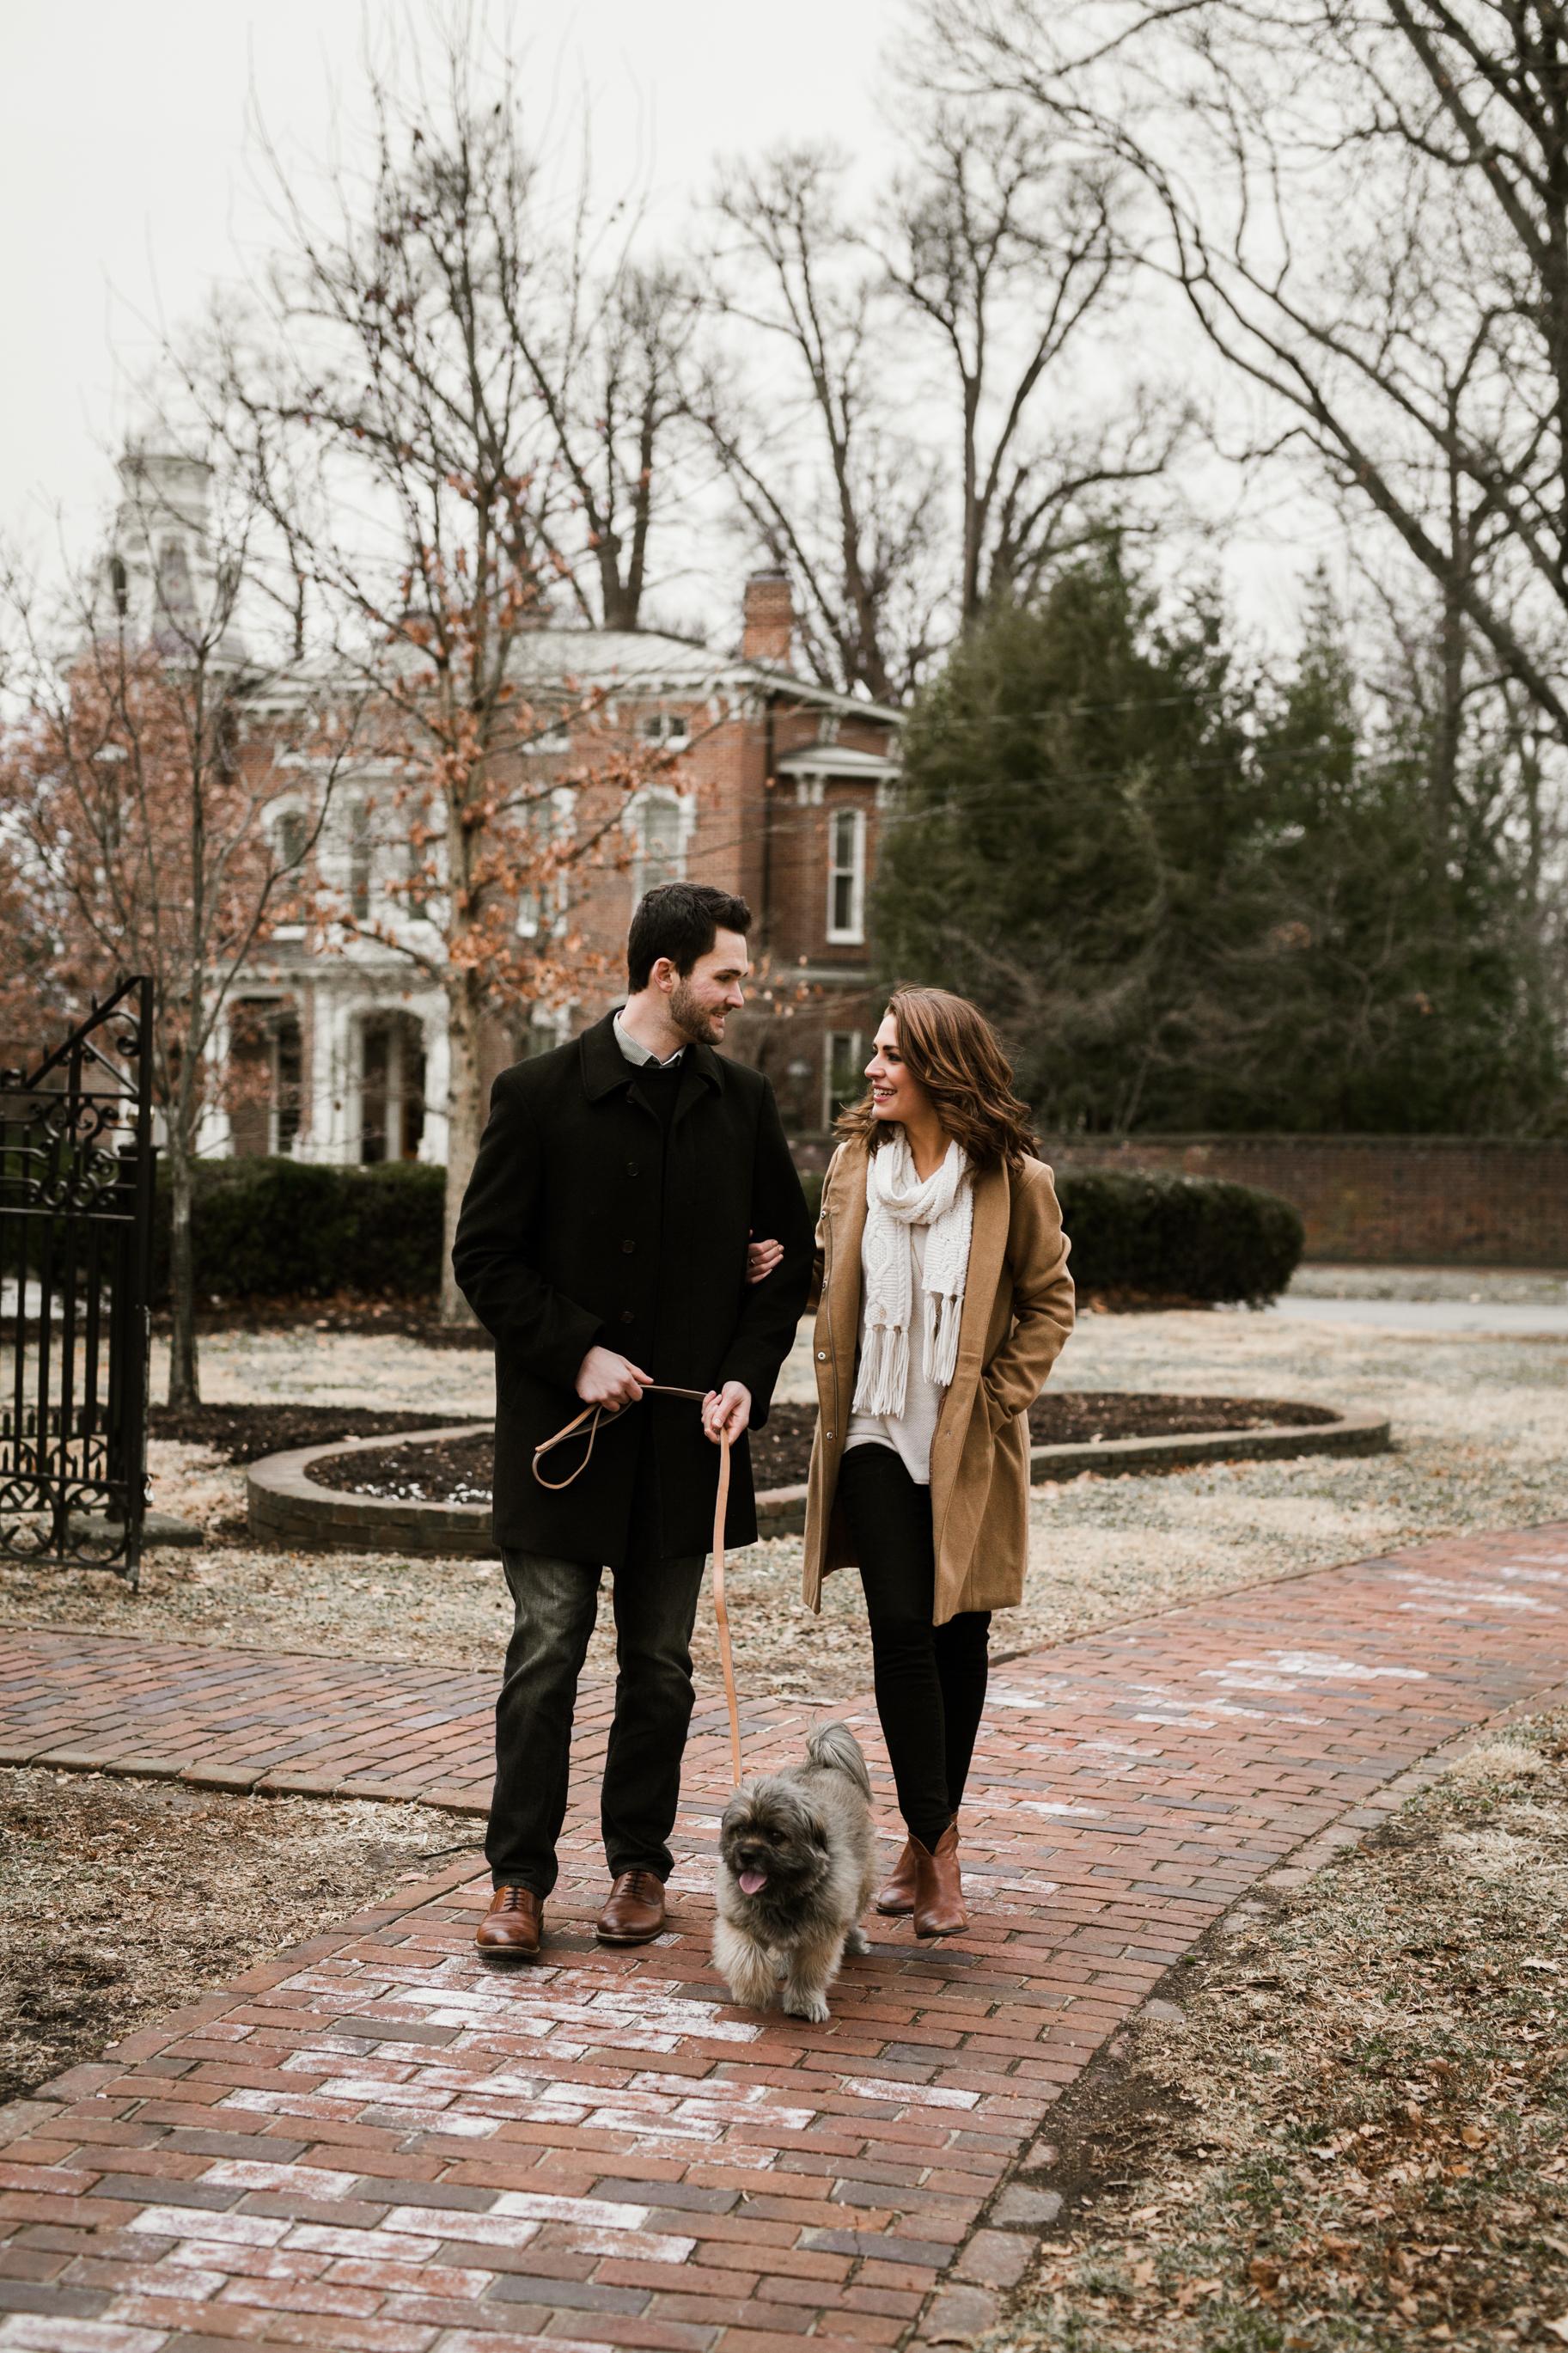 Ellen & Lee Engagement 2018 WEBSITE SP Crystal Ludwick Photo (1 of 54).jpg